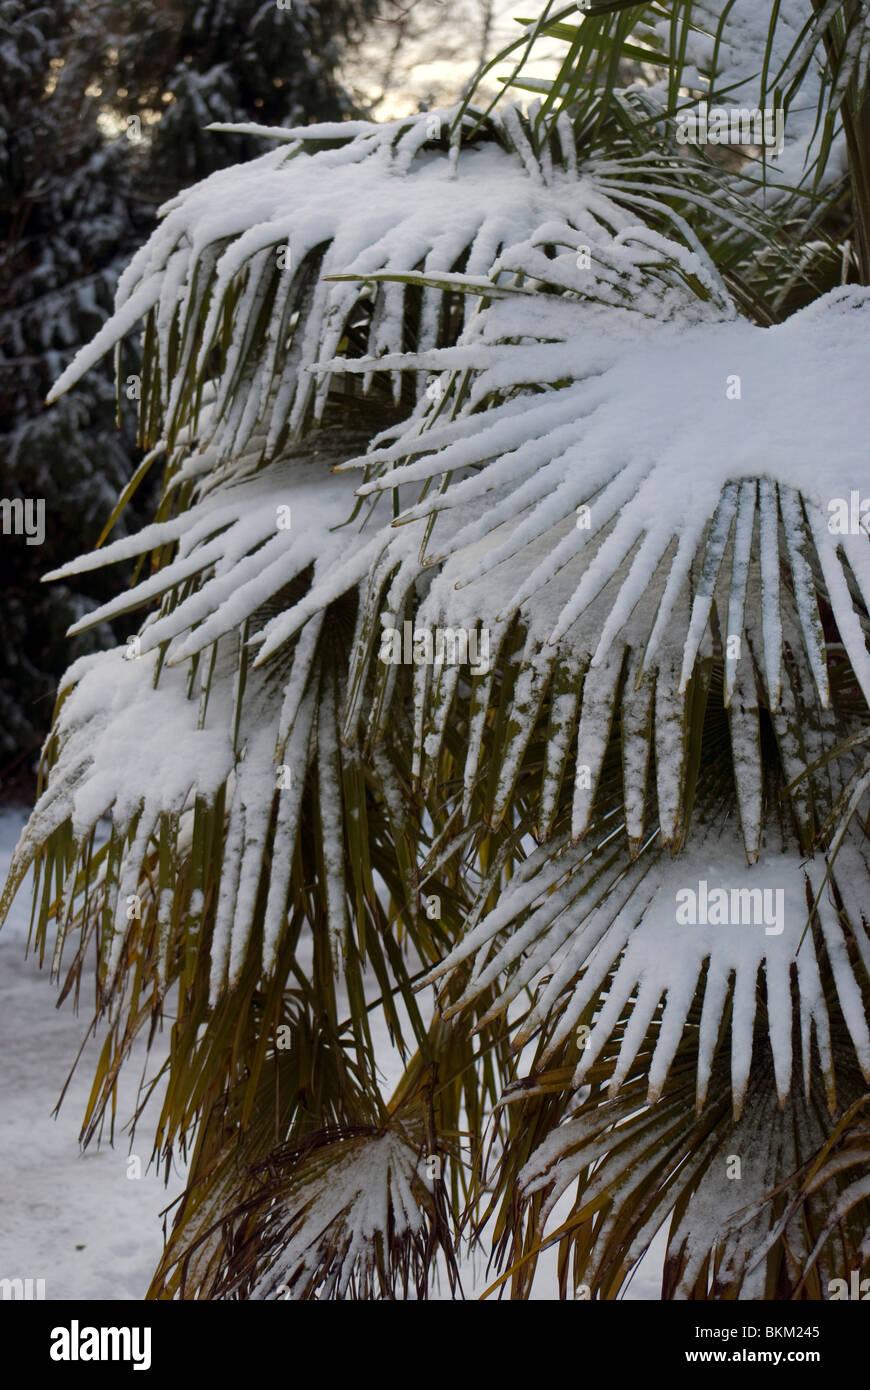 Snow on a palm plant in the Royal Botanic Garden, Edinburgh, Scotland. - Stock Image